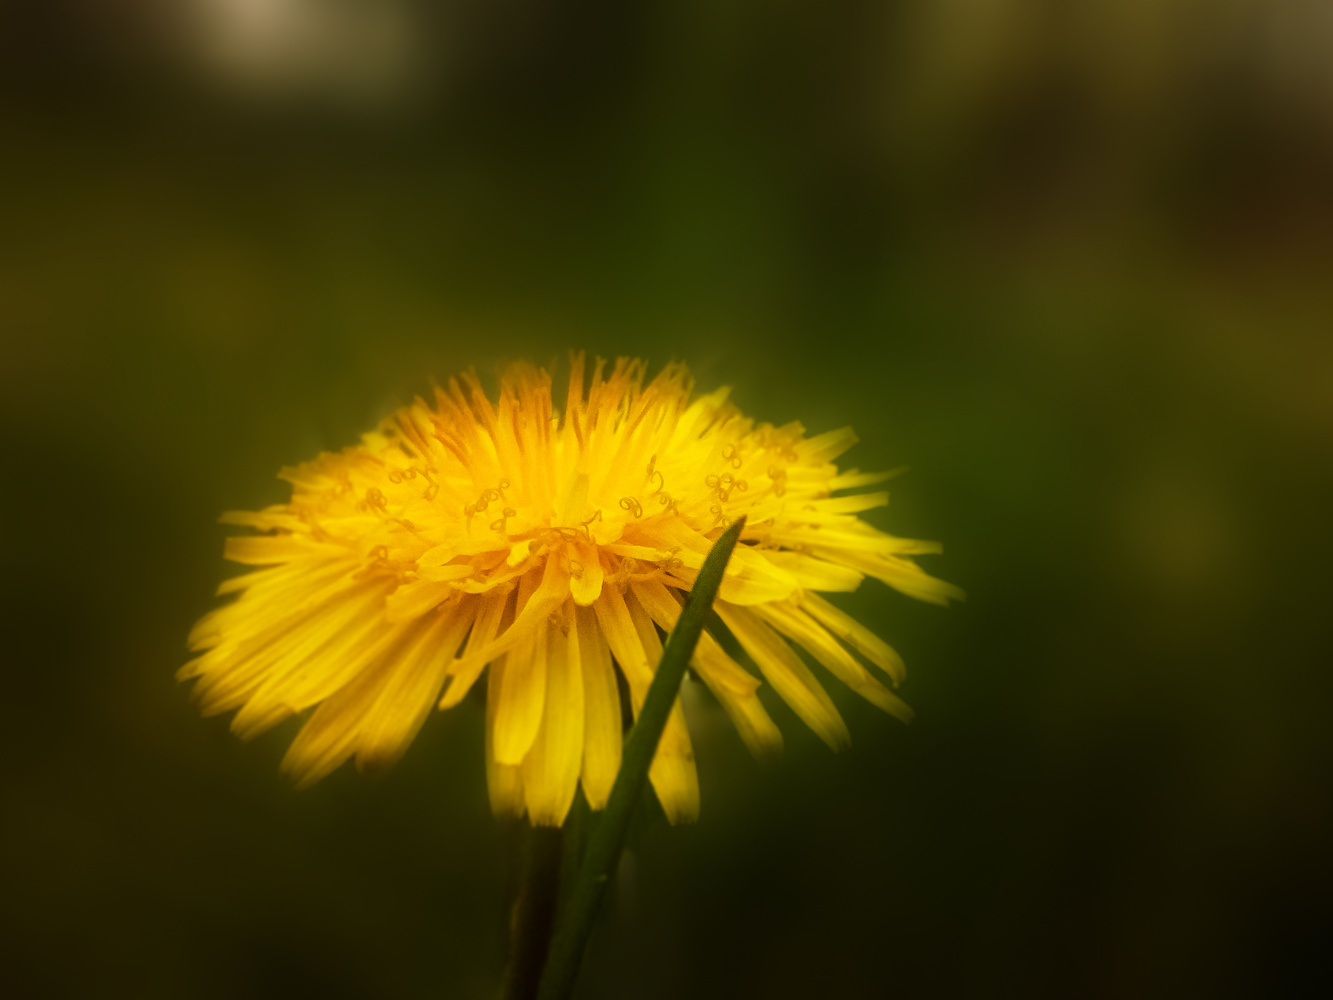 Dandelion by Dijana Kr